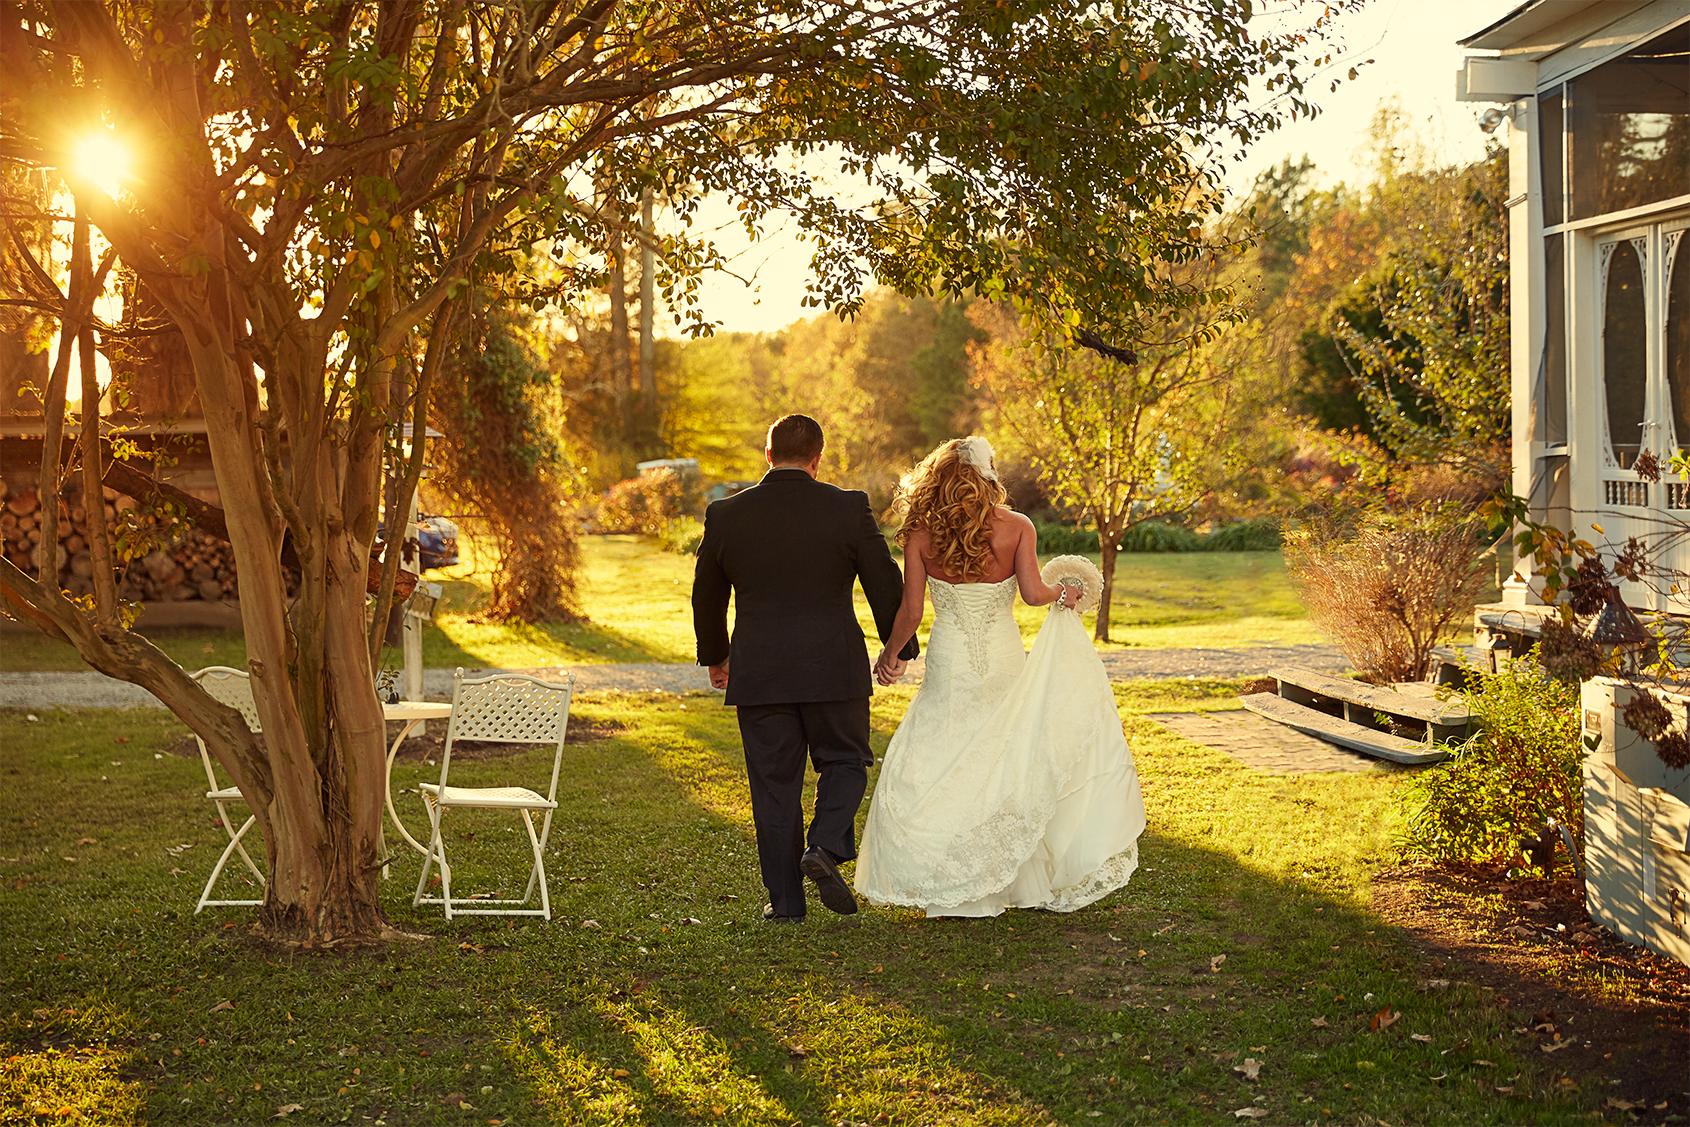 _P_00084Tina-And-Miles-Wedding_N,2015_Raleigh_NC_ErnestoSue382.jpeg